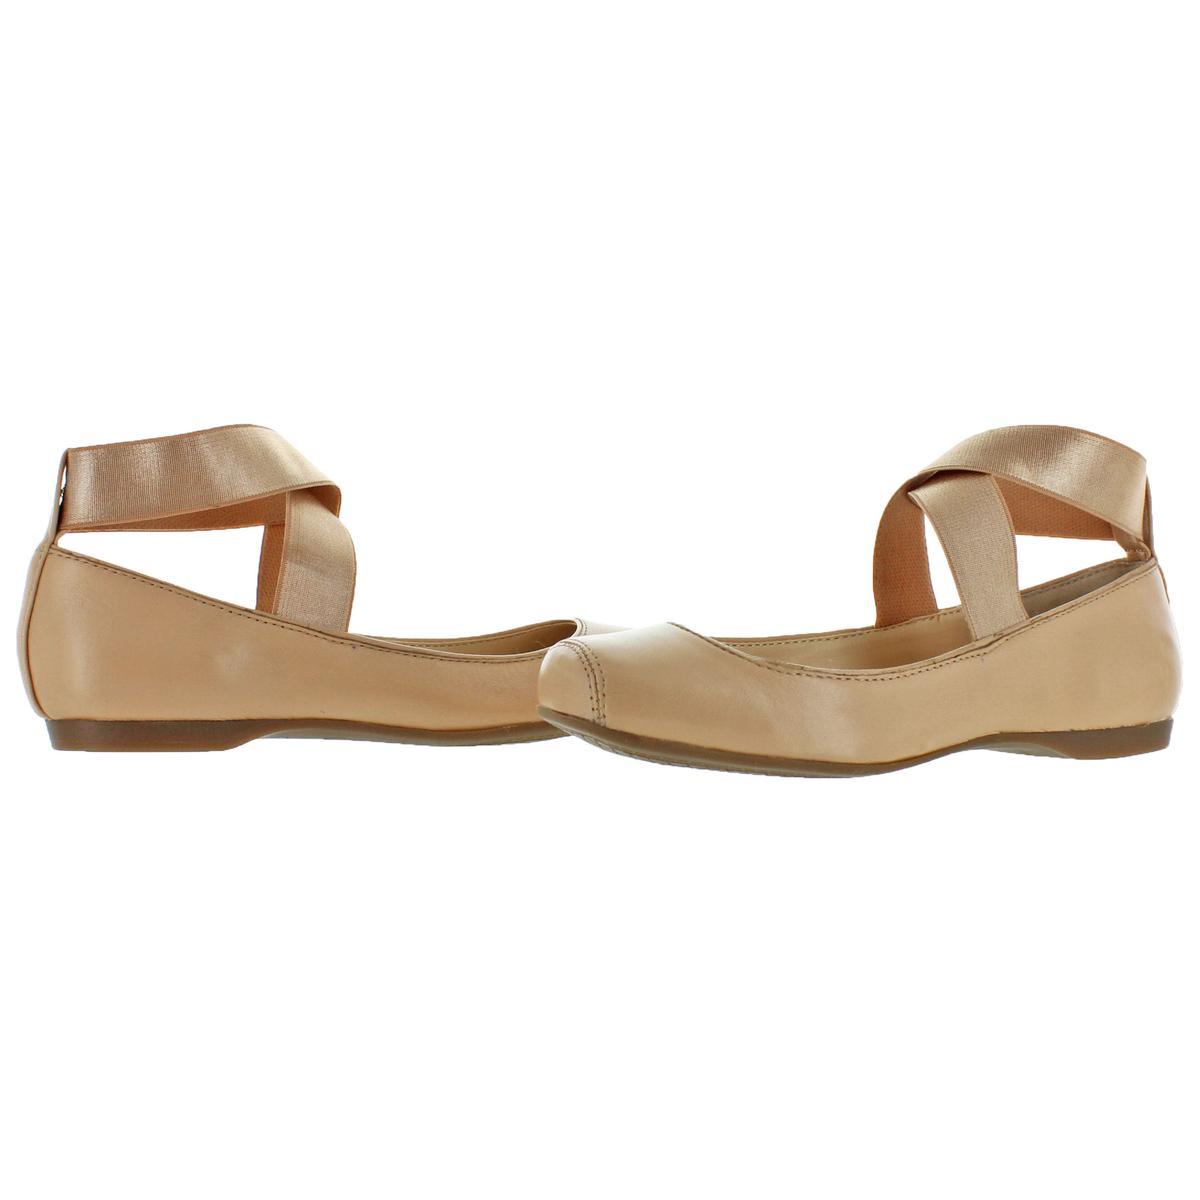 Jessica-Simpson-Women-039-s-Mandalaye-Square-Toe-Ankle-Wrap-Ballet-Flats thumbnail 15